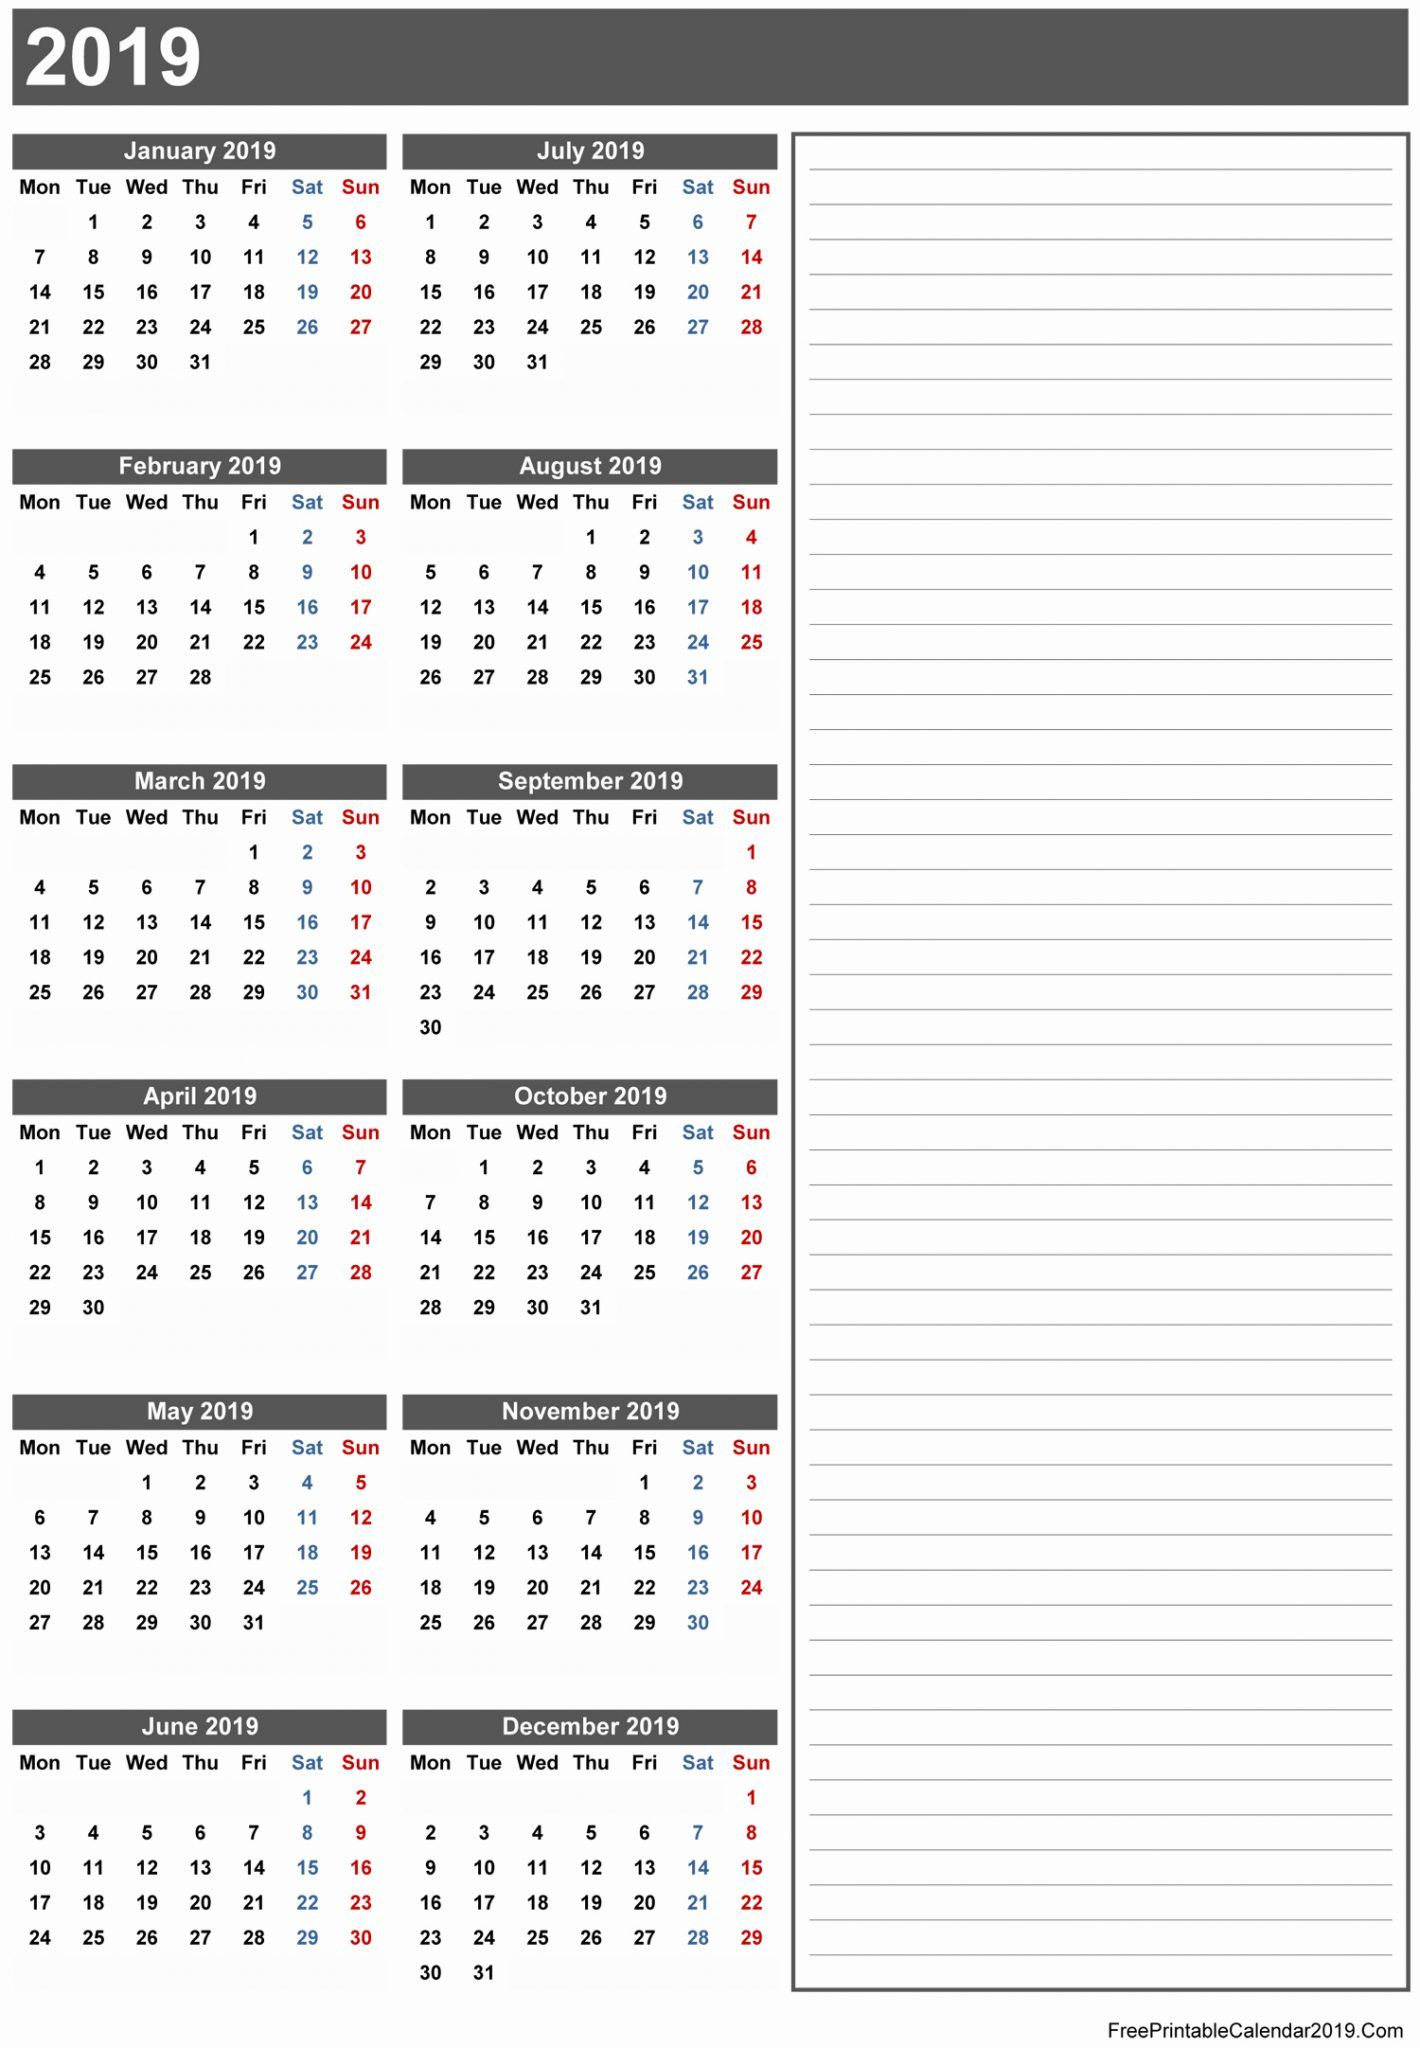 Free Printable Calendar 2019 With Holidays | Blank 12 Month Calendar within Excel 3 Month Calendar Template